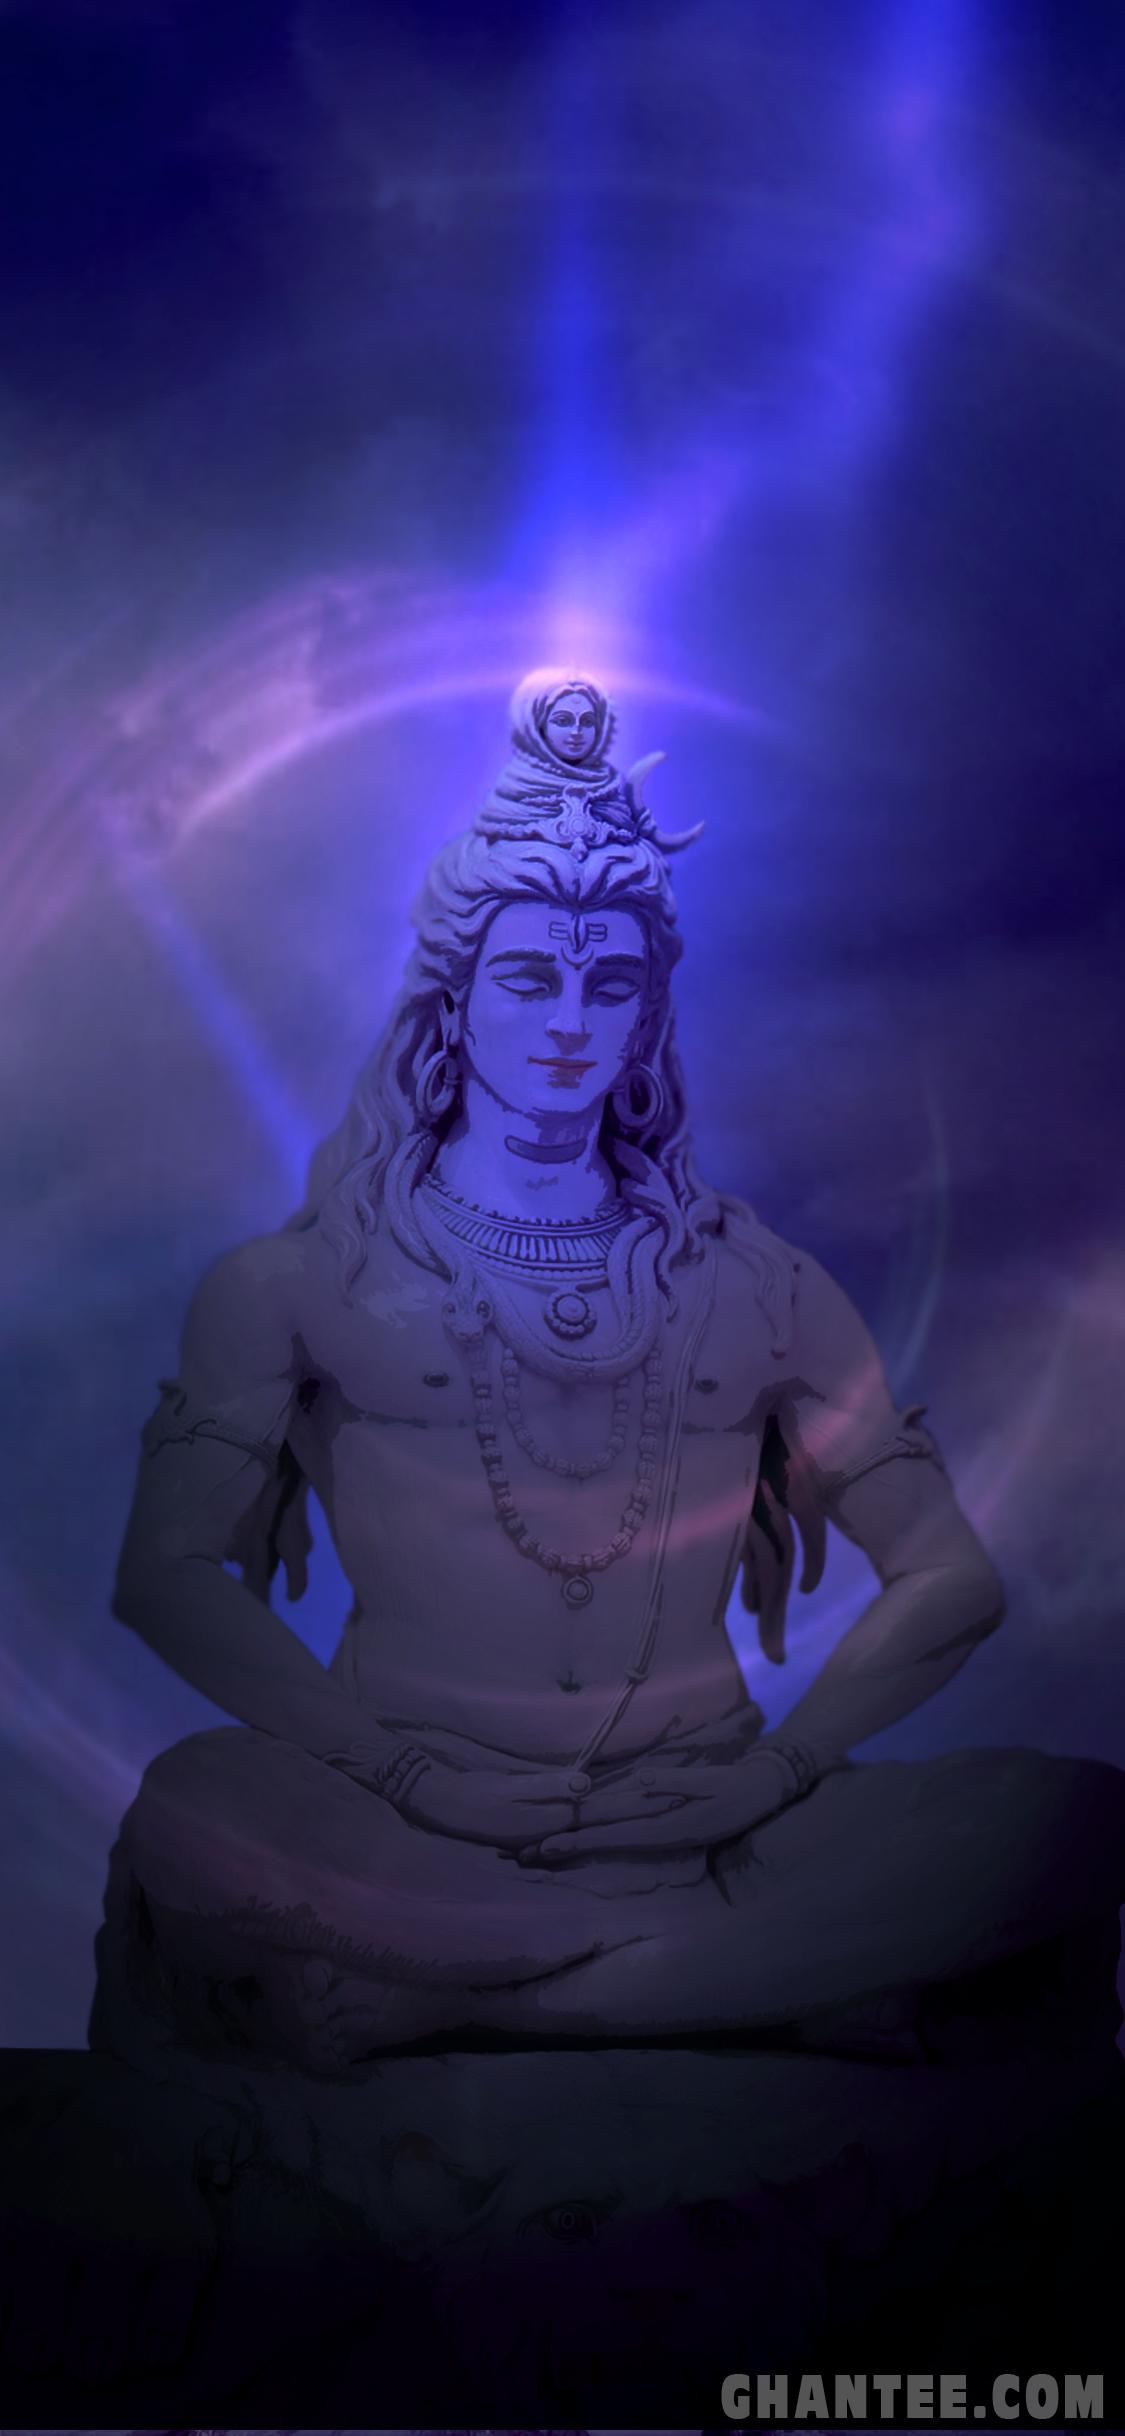 Meditating Shiv Bhagwan Wallpaper For Iphone X Ghantee